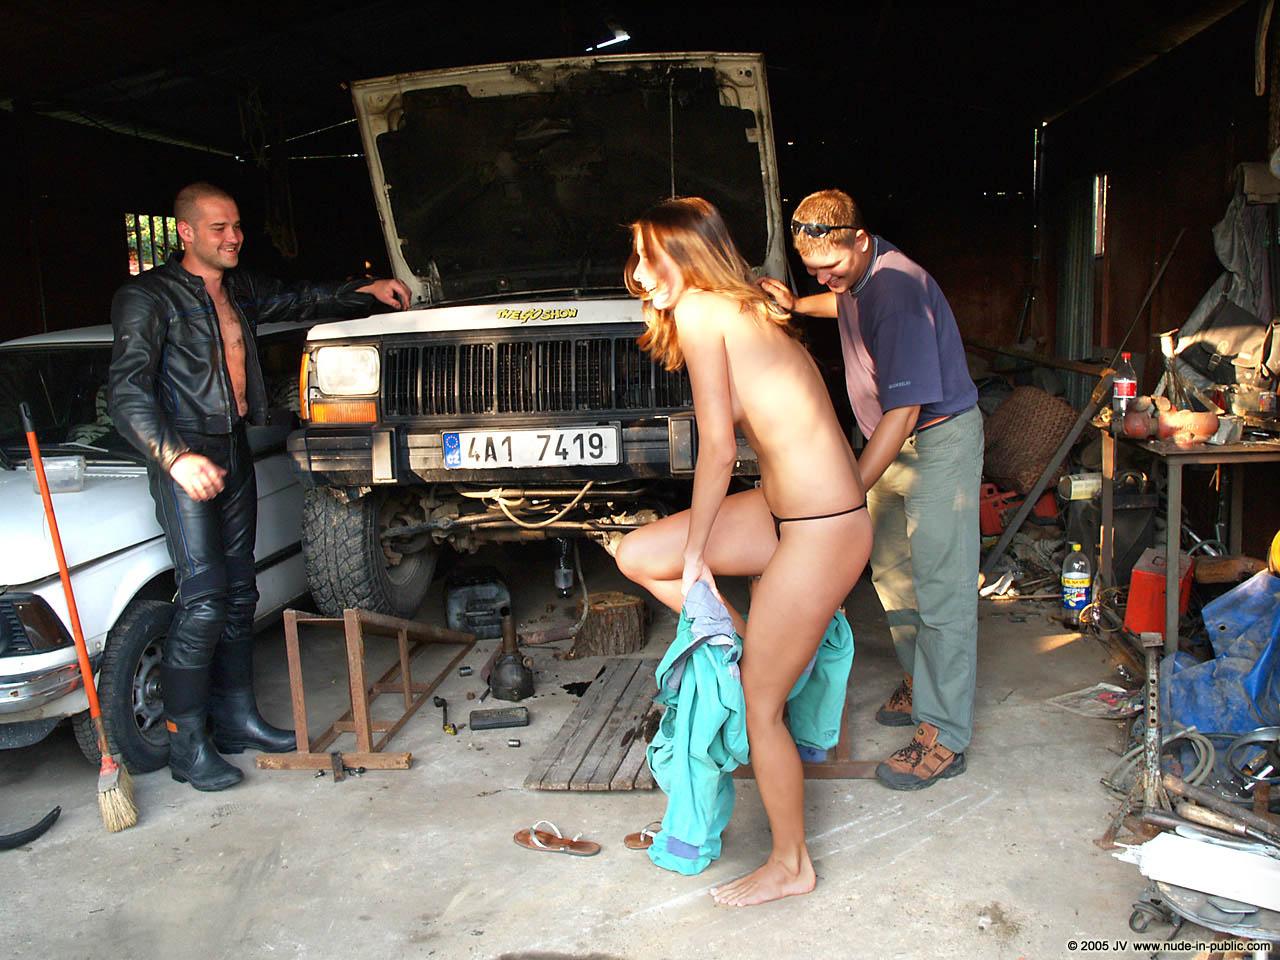 veronika-e-junkyard-cars-mechanic-nude-in-public-05